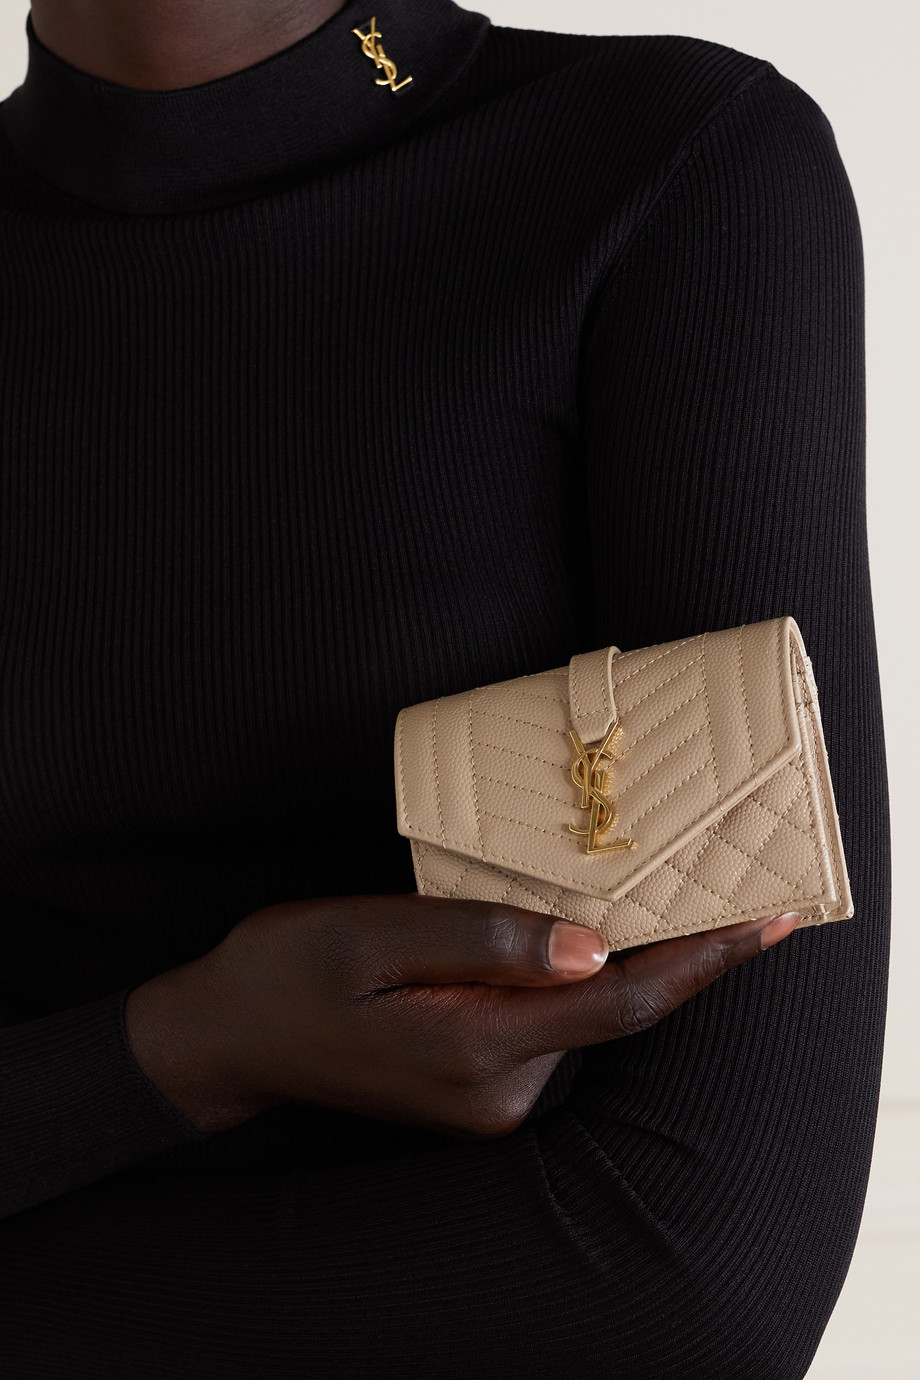 SAINT LAURENT Envelope Portemonnaie aus gestepptem strukturiertem Leder